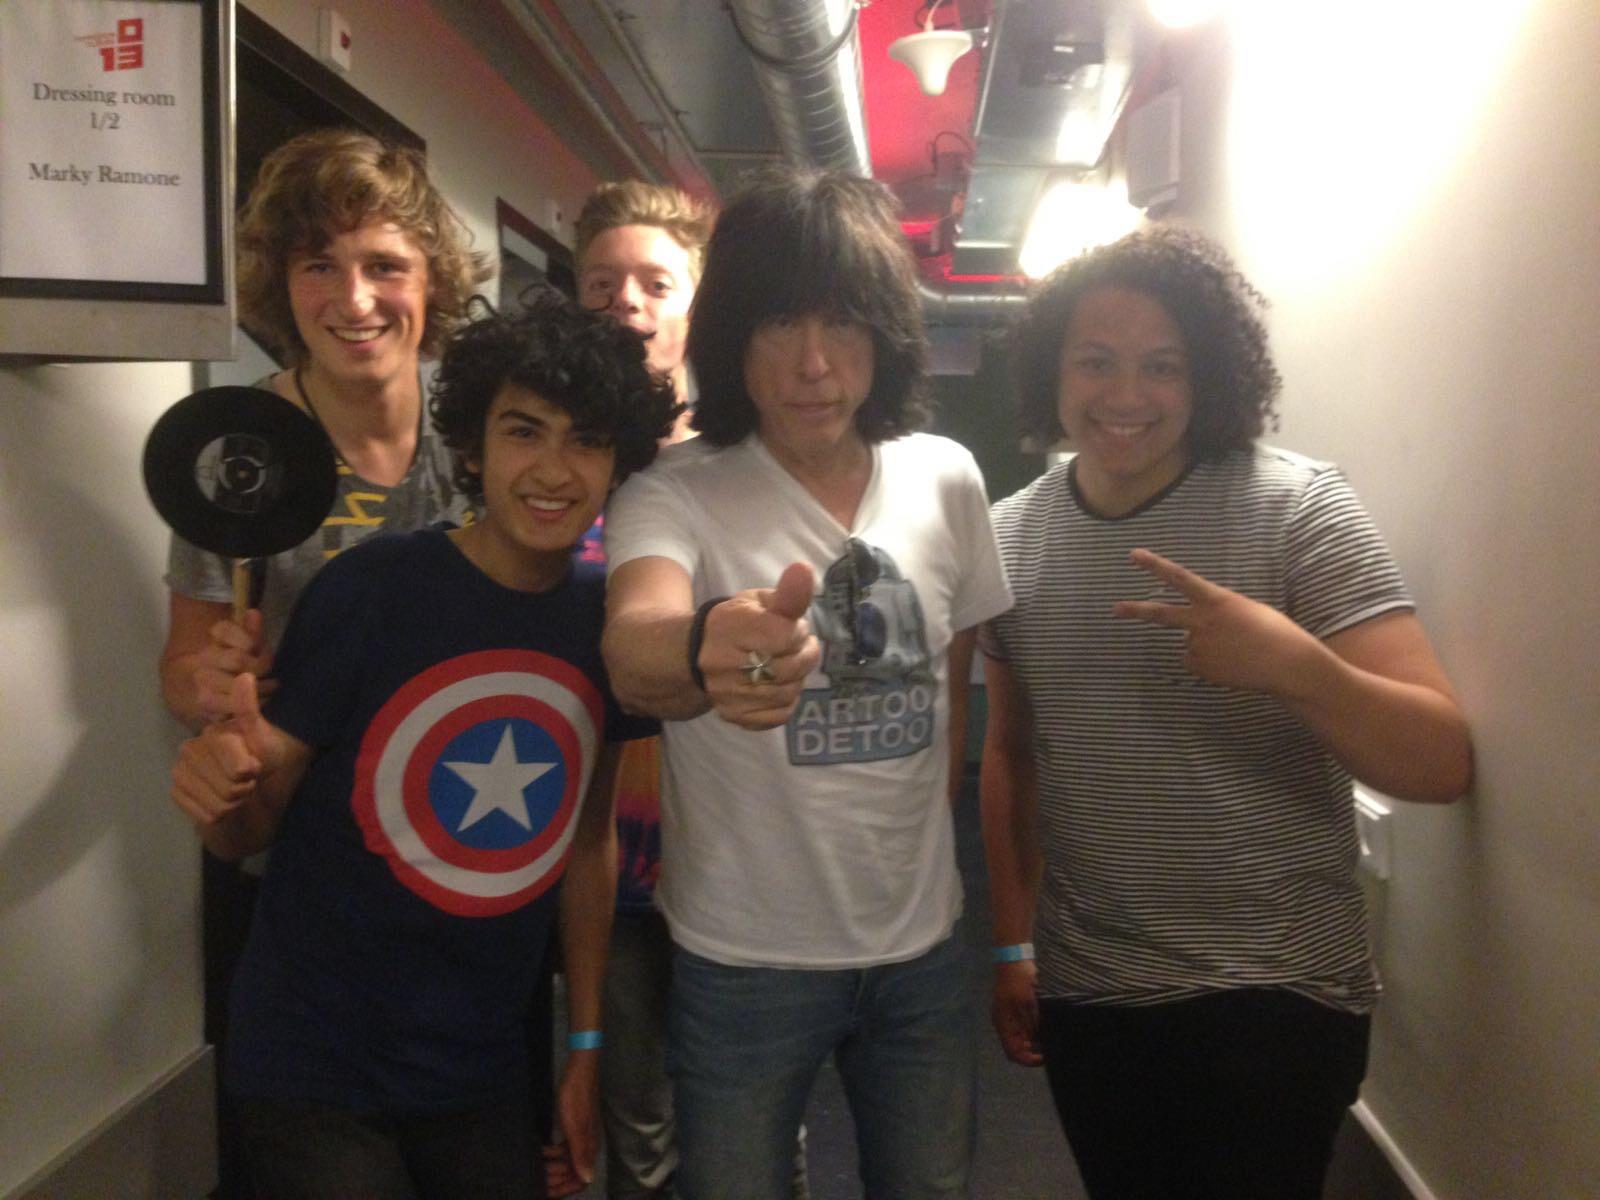 Forever Saturday with Marky Ramone Alternative Punkrock Den Haag